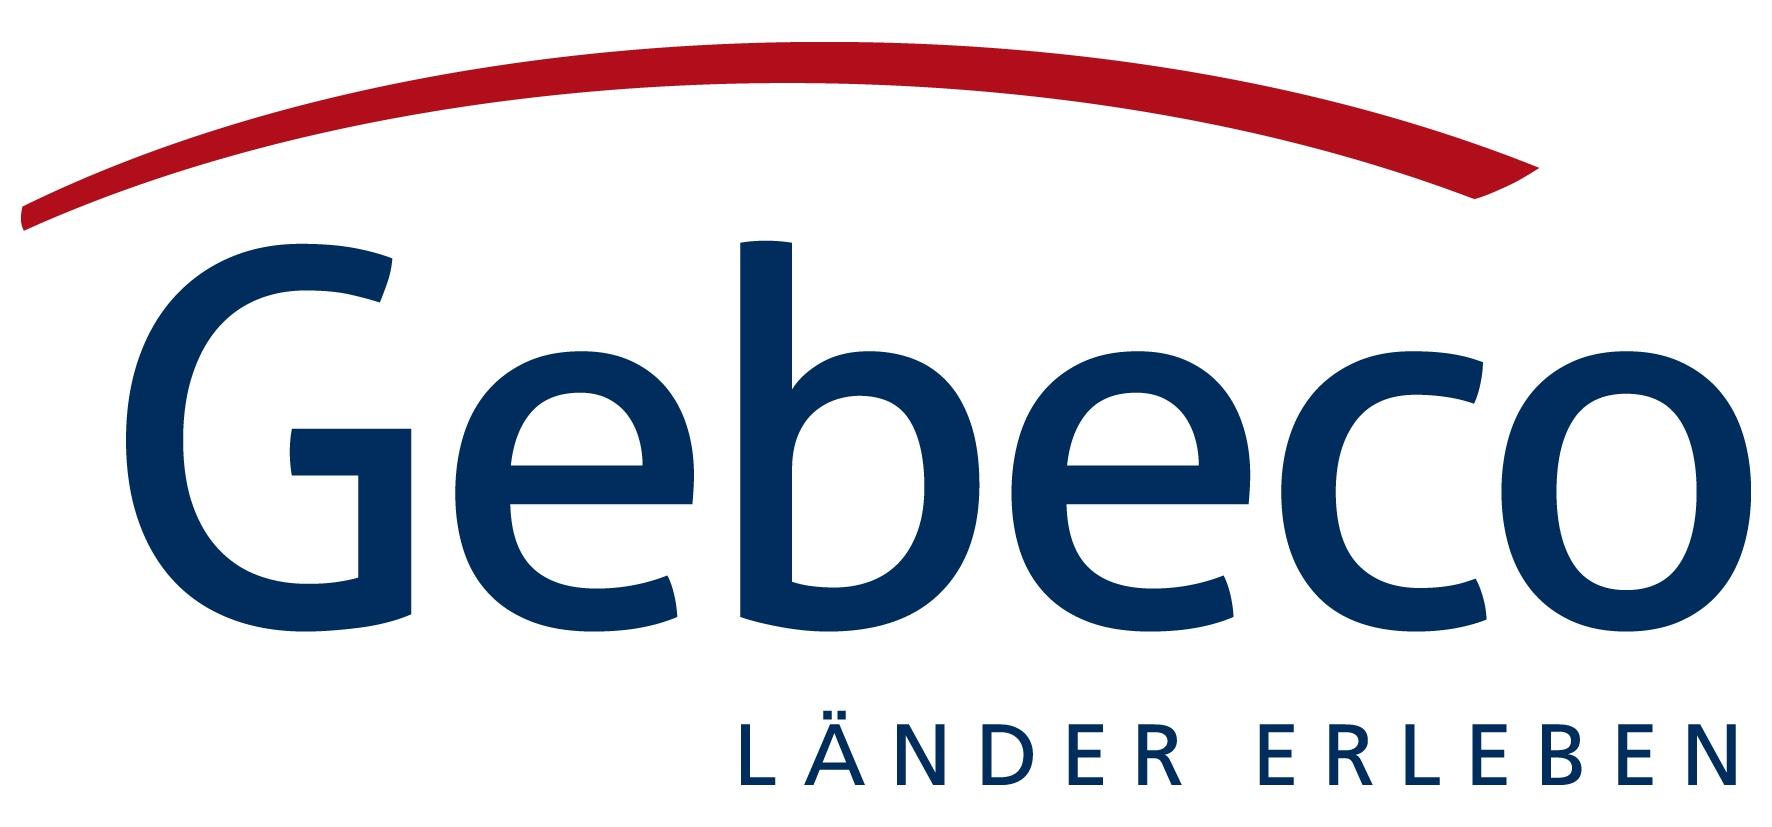 Logo Gebeco RGB Gebeco GmbH & Co. KG, Kiel, Germany